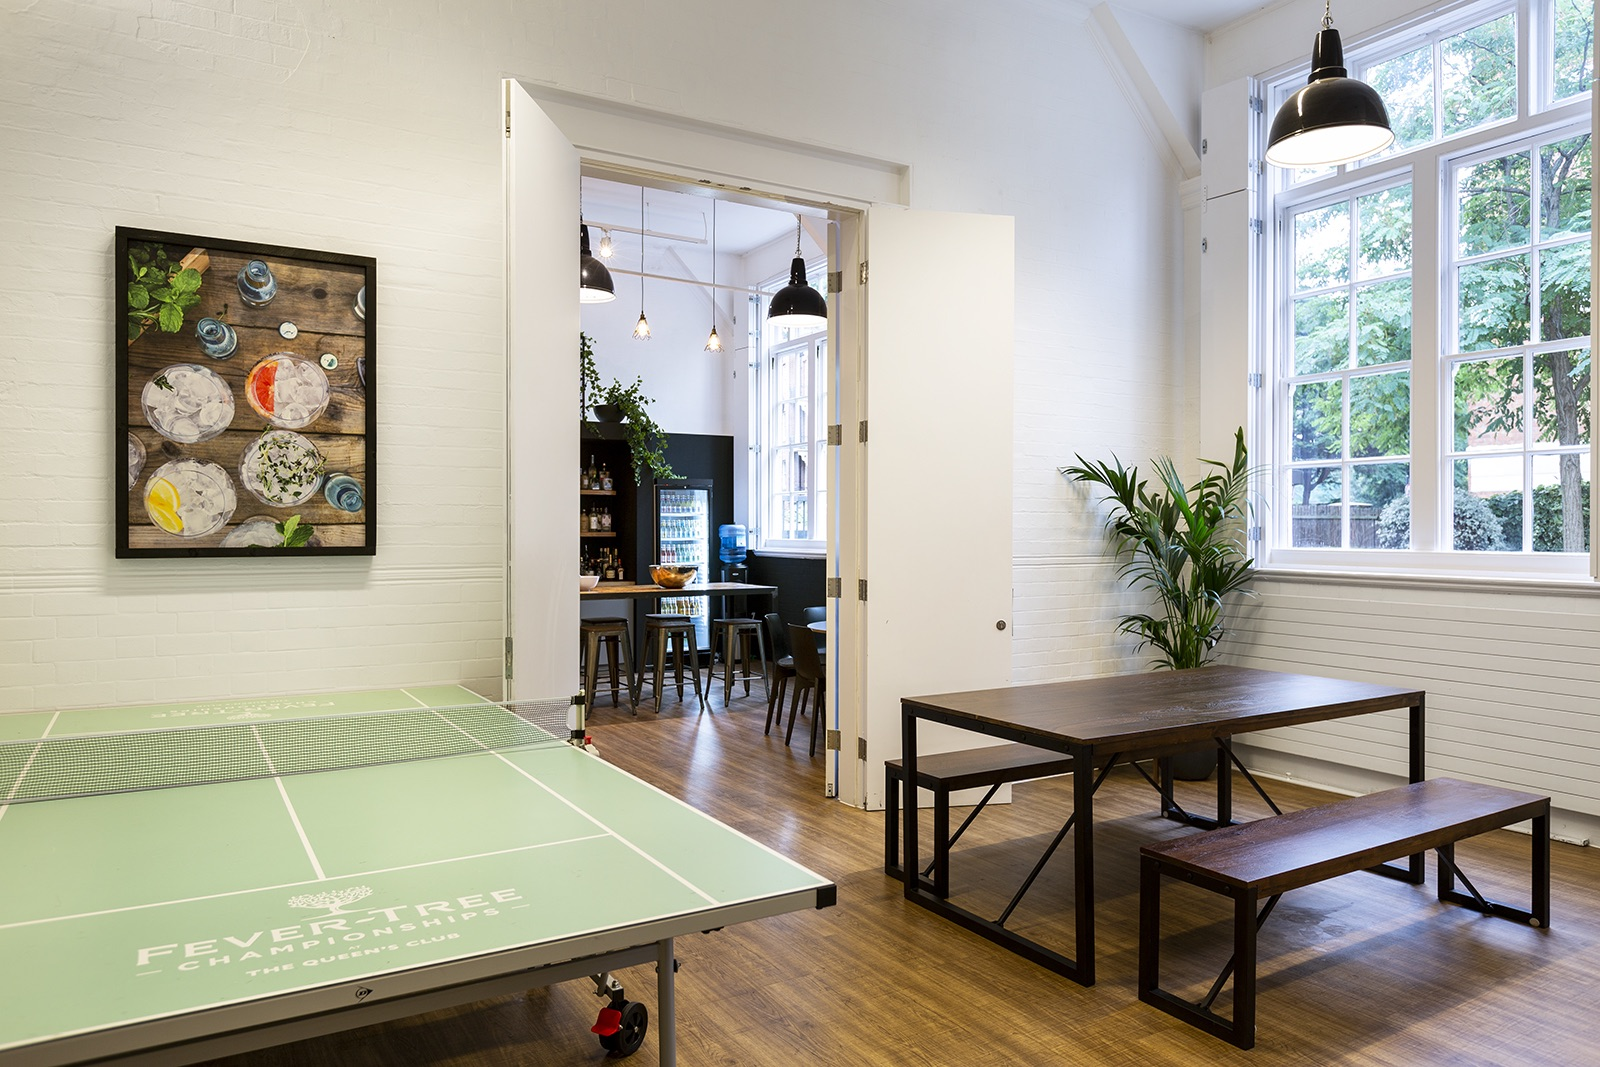 fevertree-office-london-6